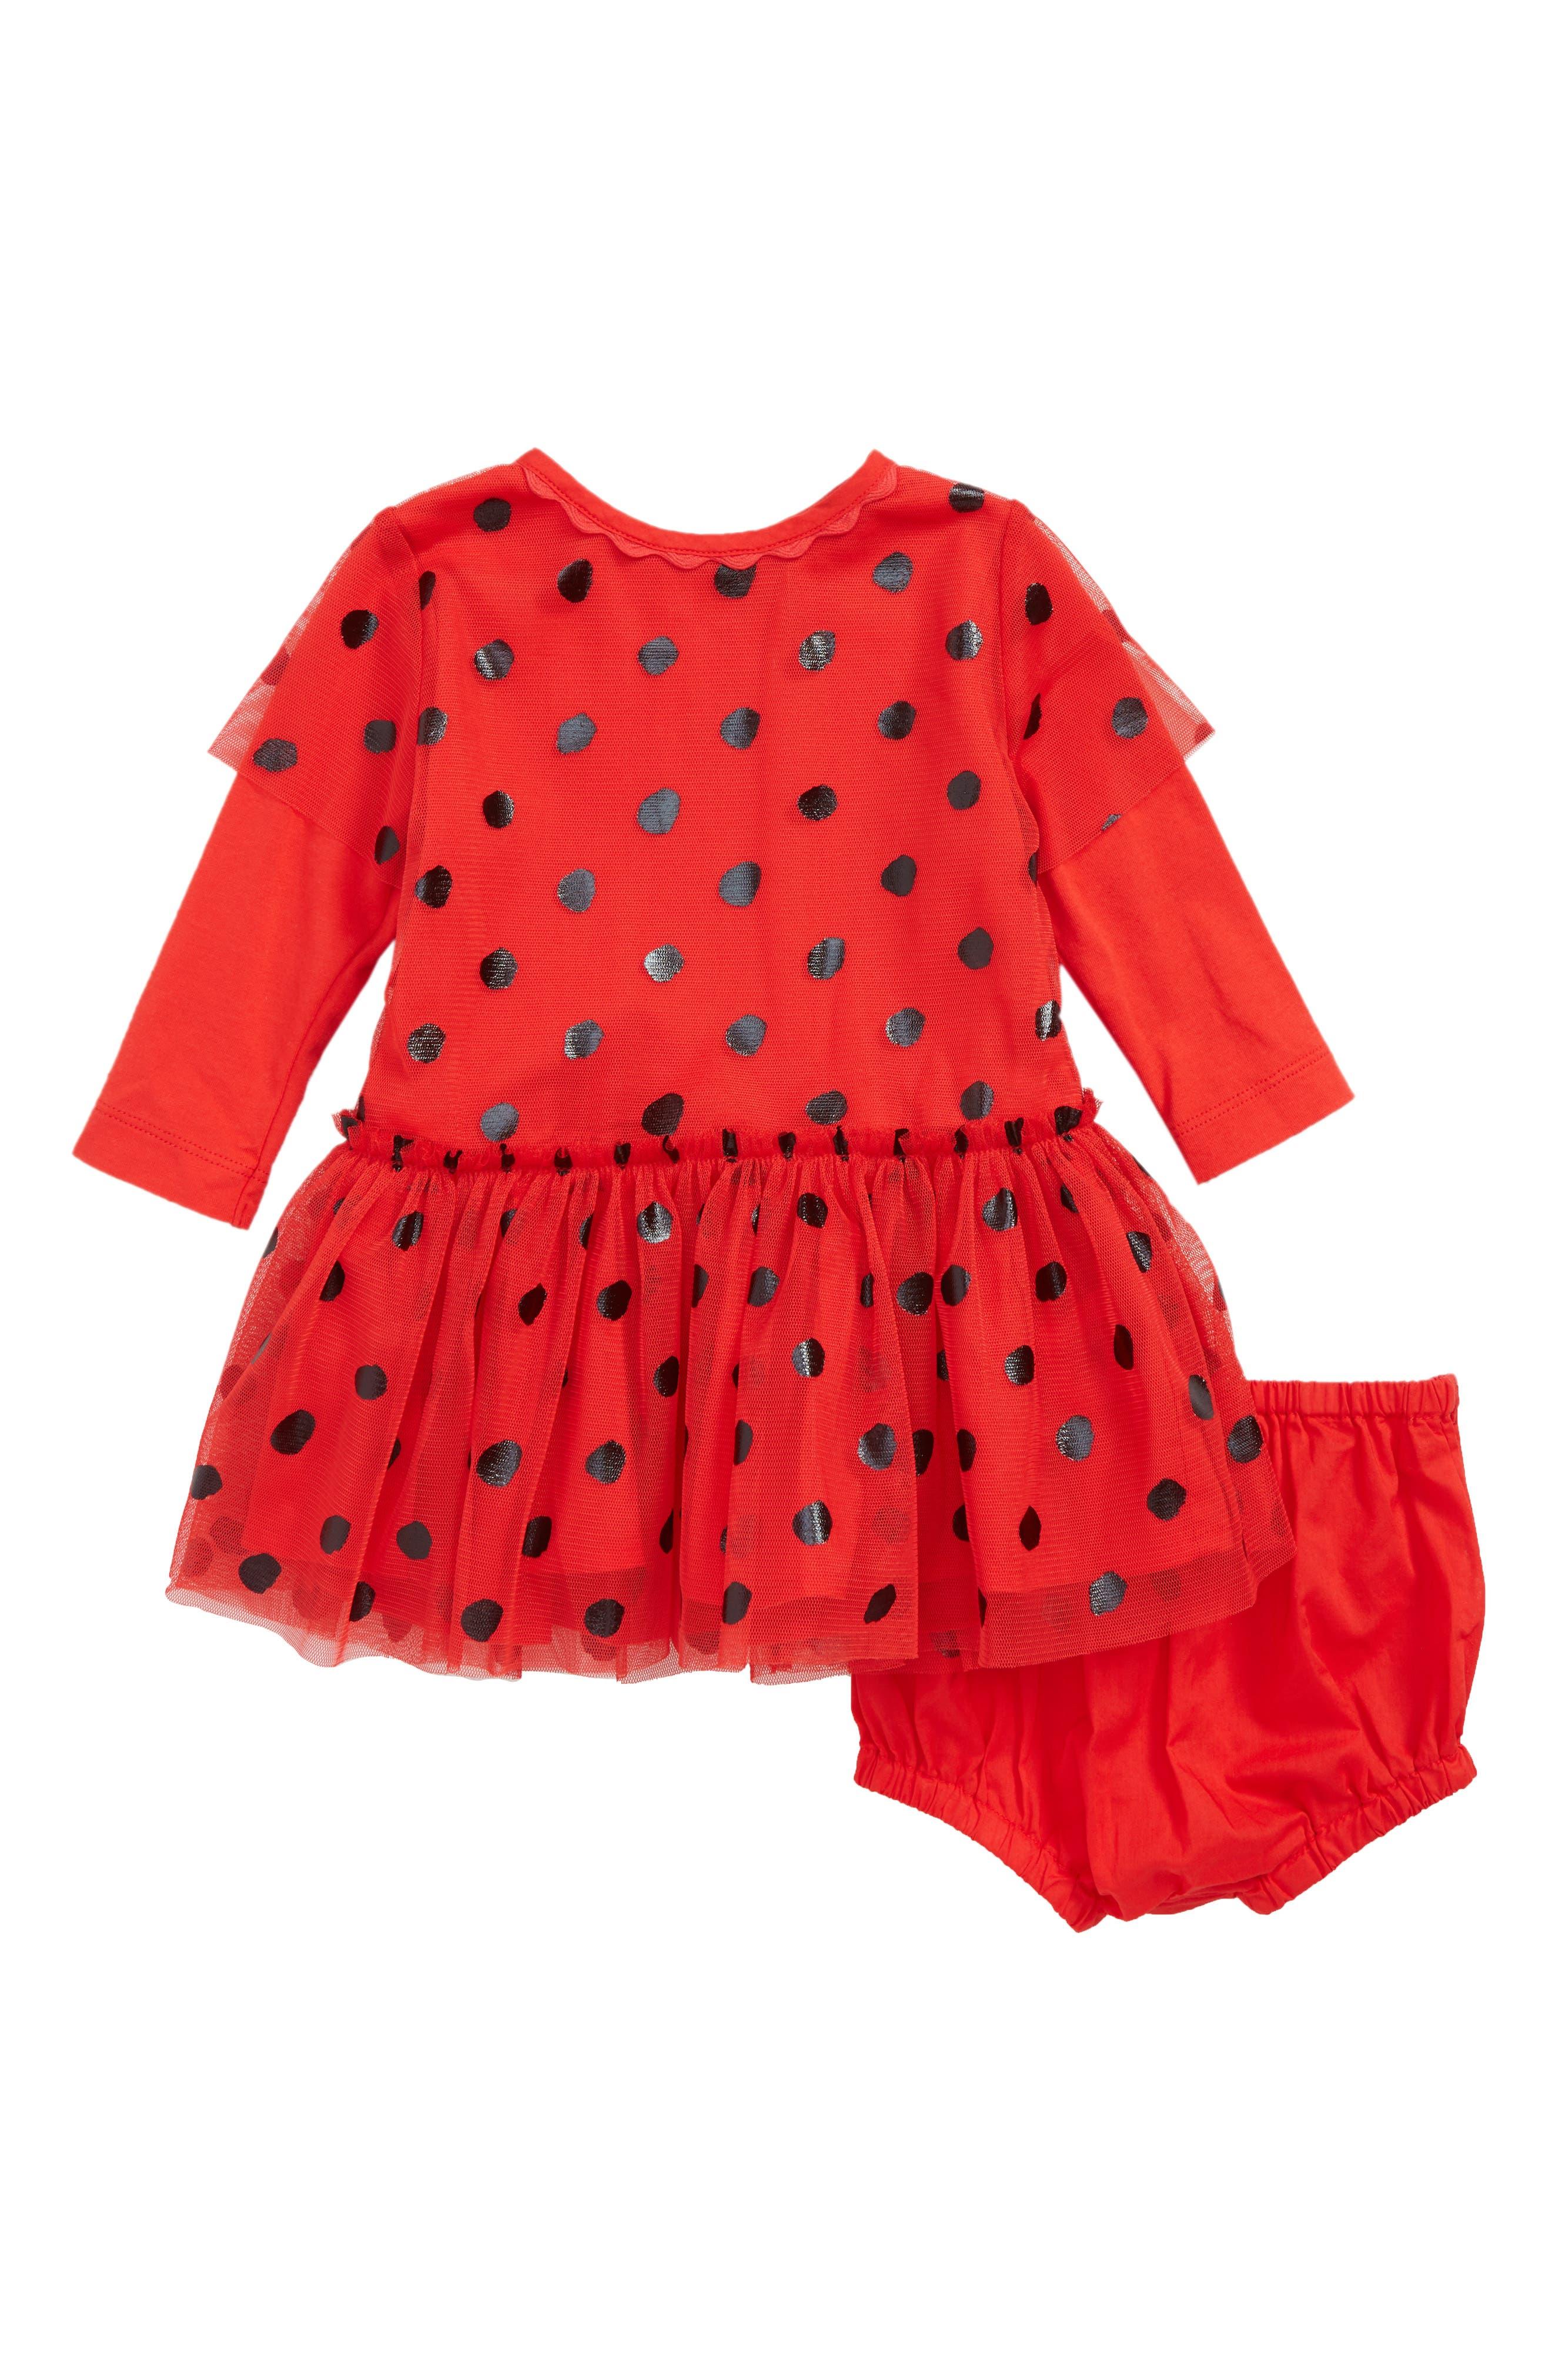 Mouse Dress & Wings Set,                             Main thumbnail 1, color,                             RED BLACK